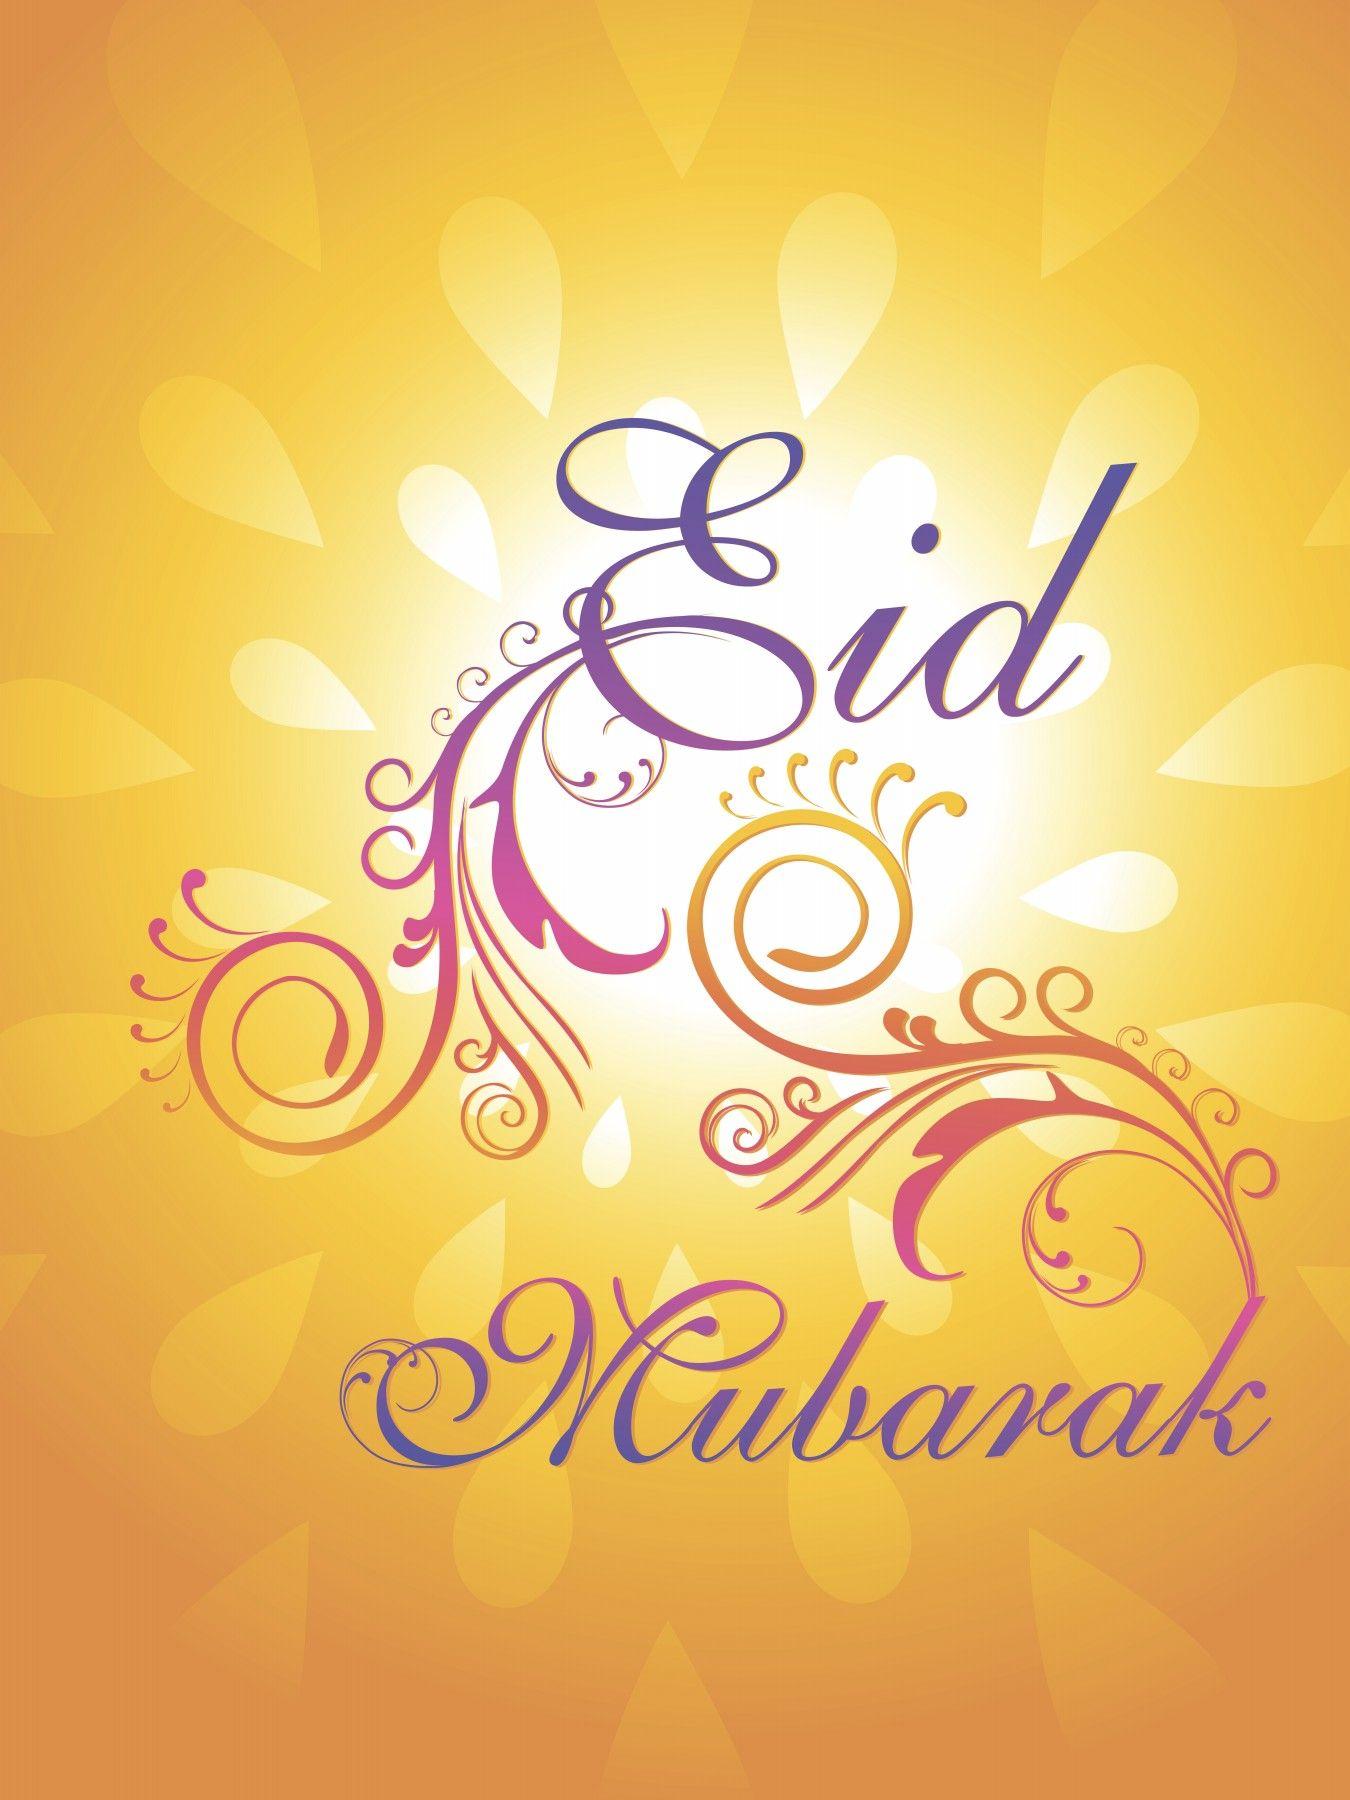 Eid mubarak eid ul fitr parents day pinterest eid and eid eid mubarak eid ul fitr parents day pinterest eid and eid mubarak kristyandbryce Choice Image